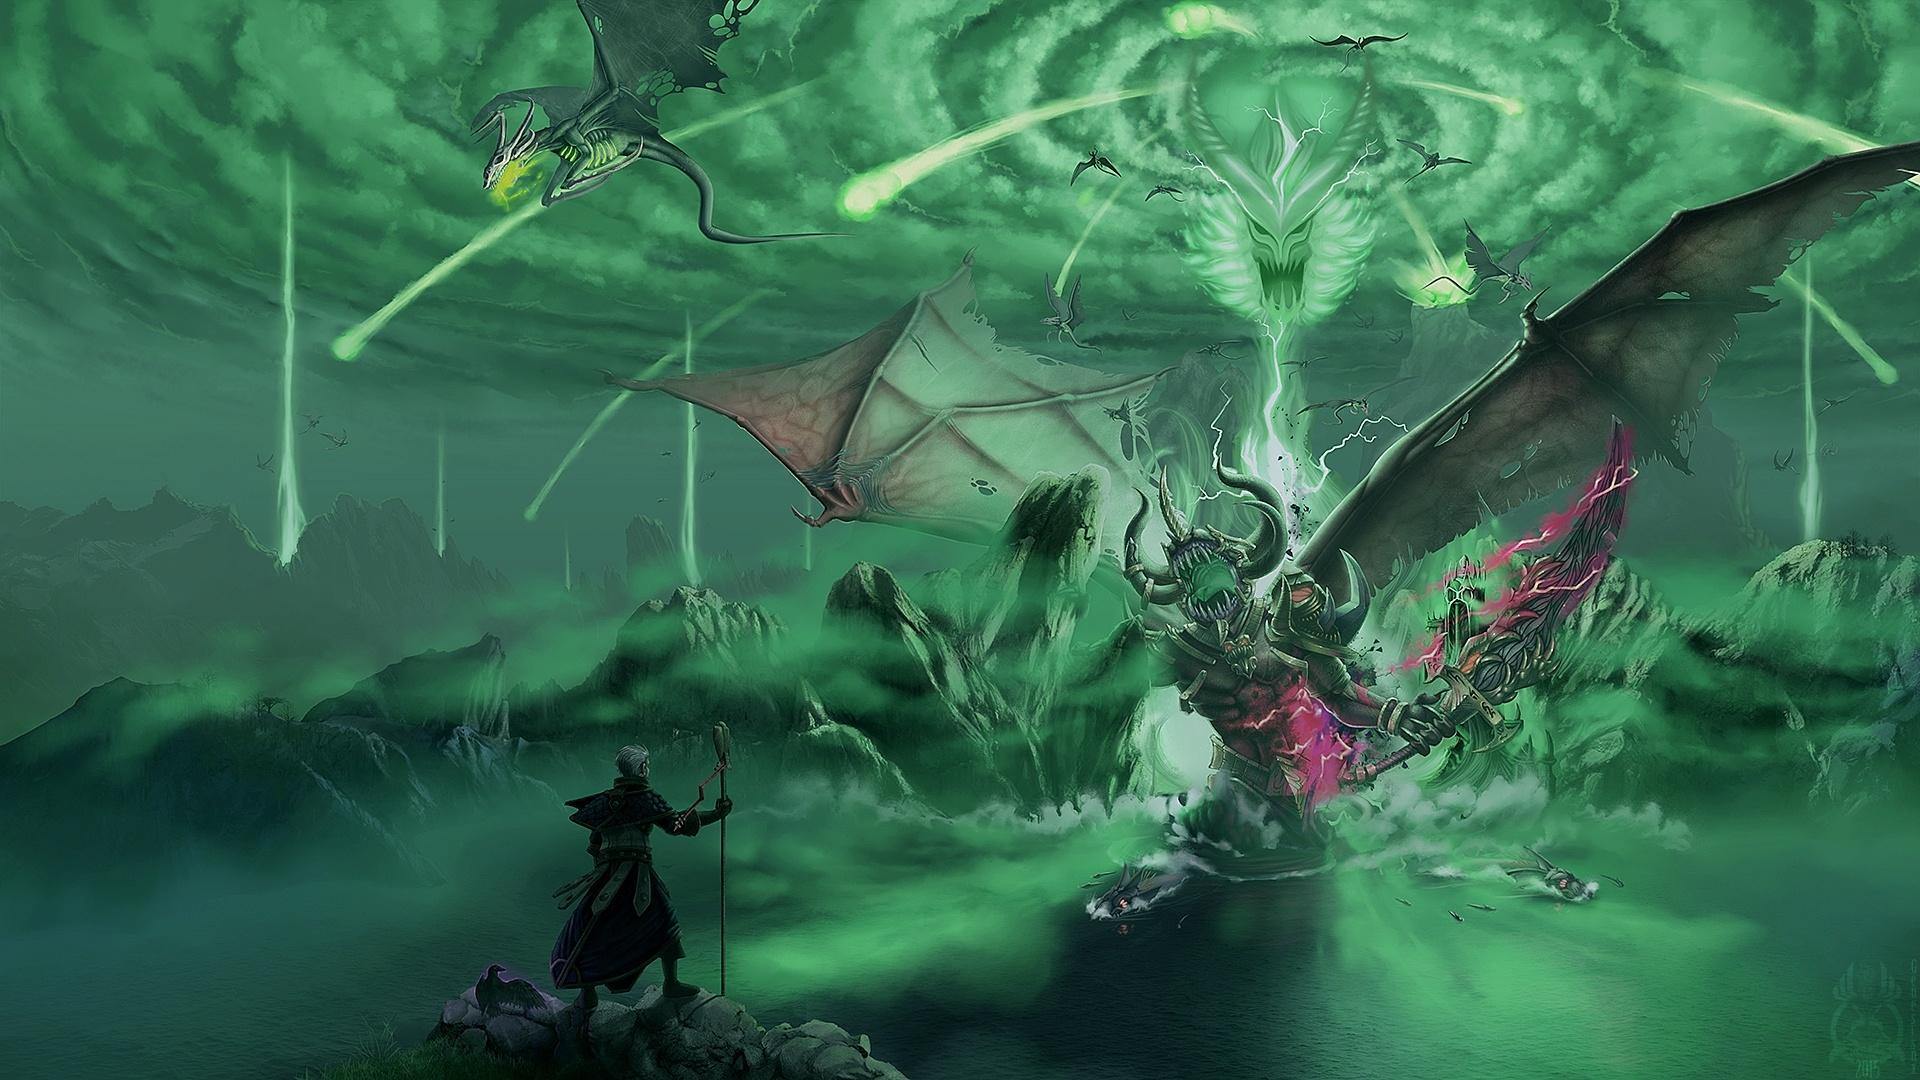 World Of Warcraft Legion Demon Hunter Best Wallpaper 1920x1080